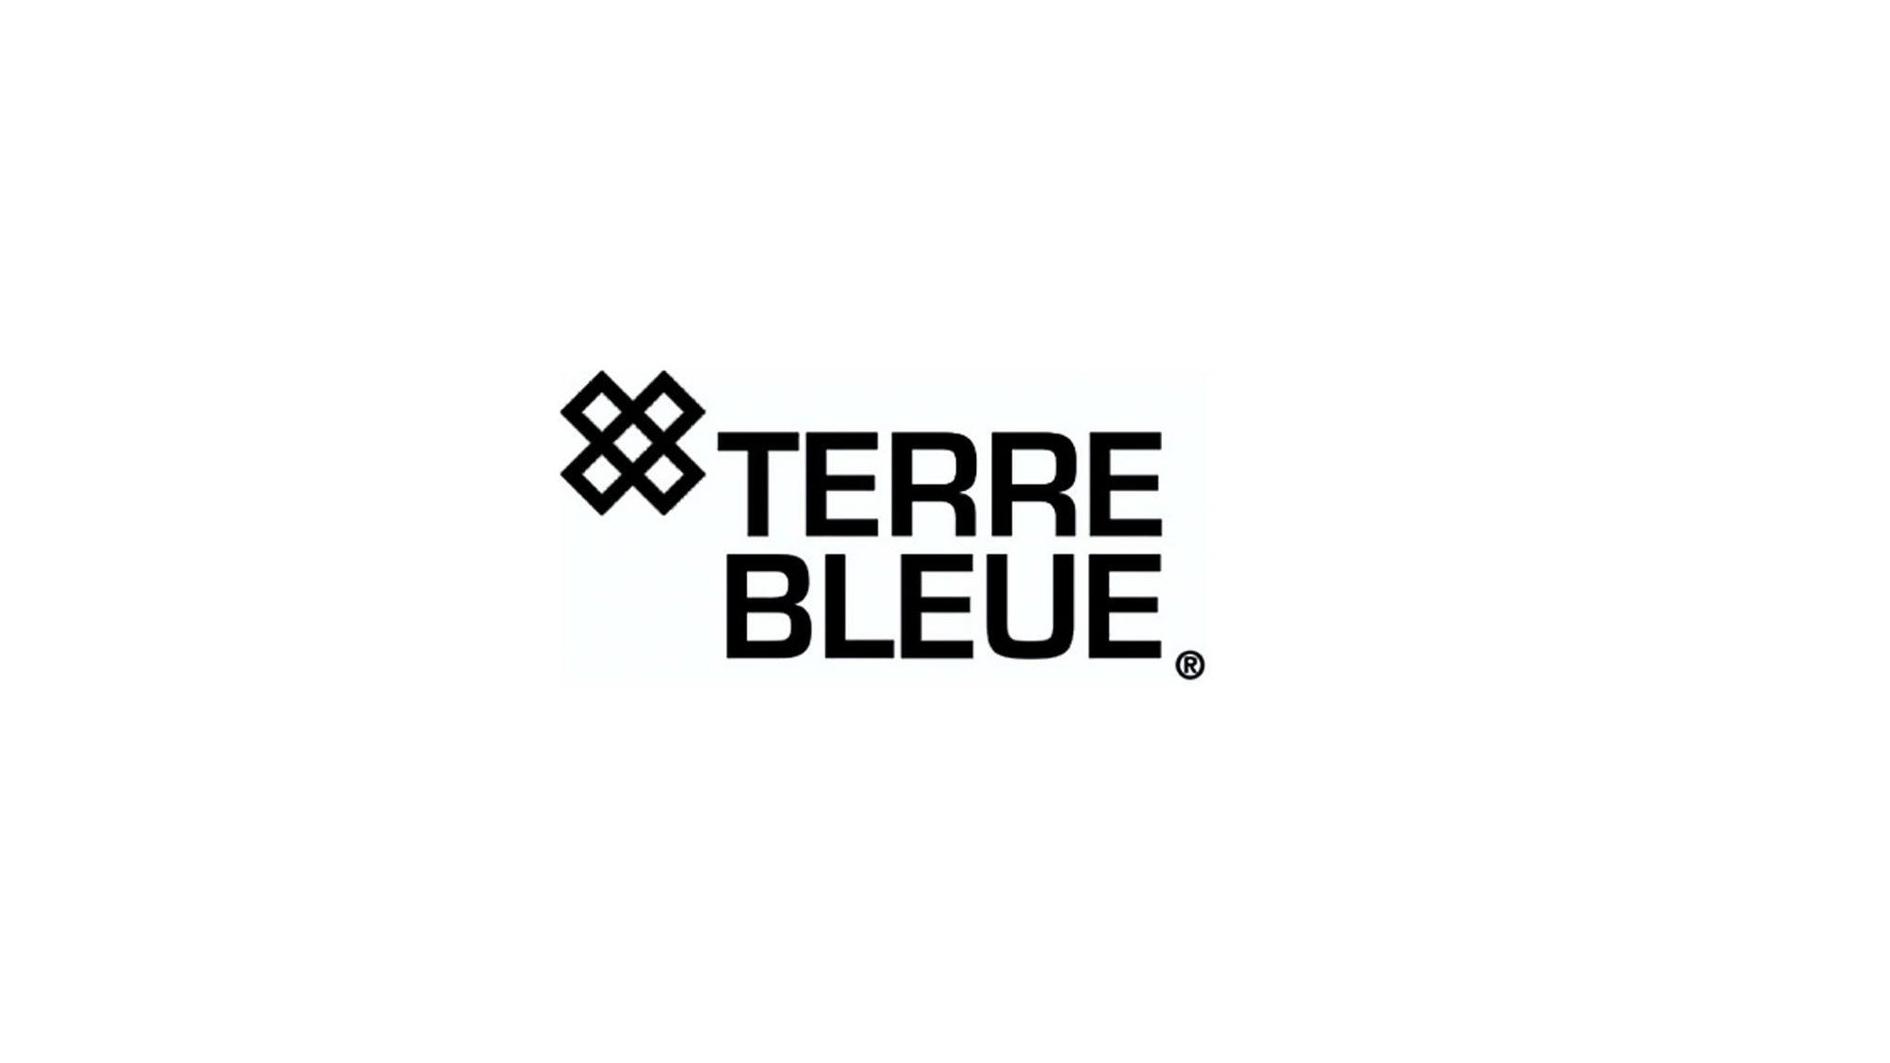 terre_bleue.jpg